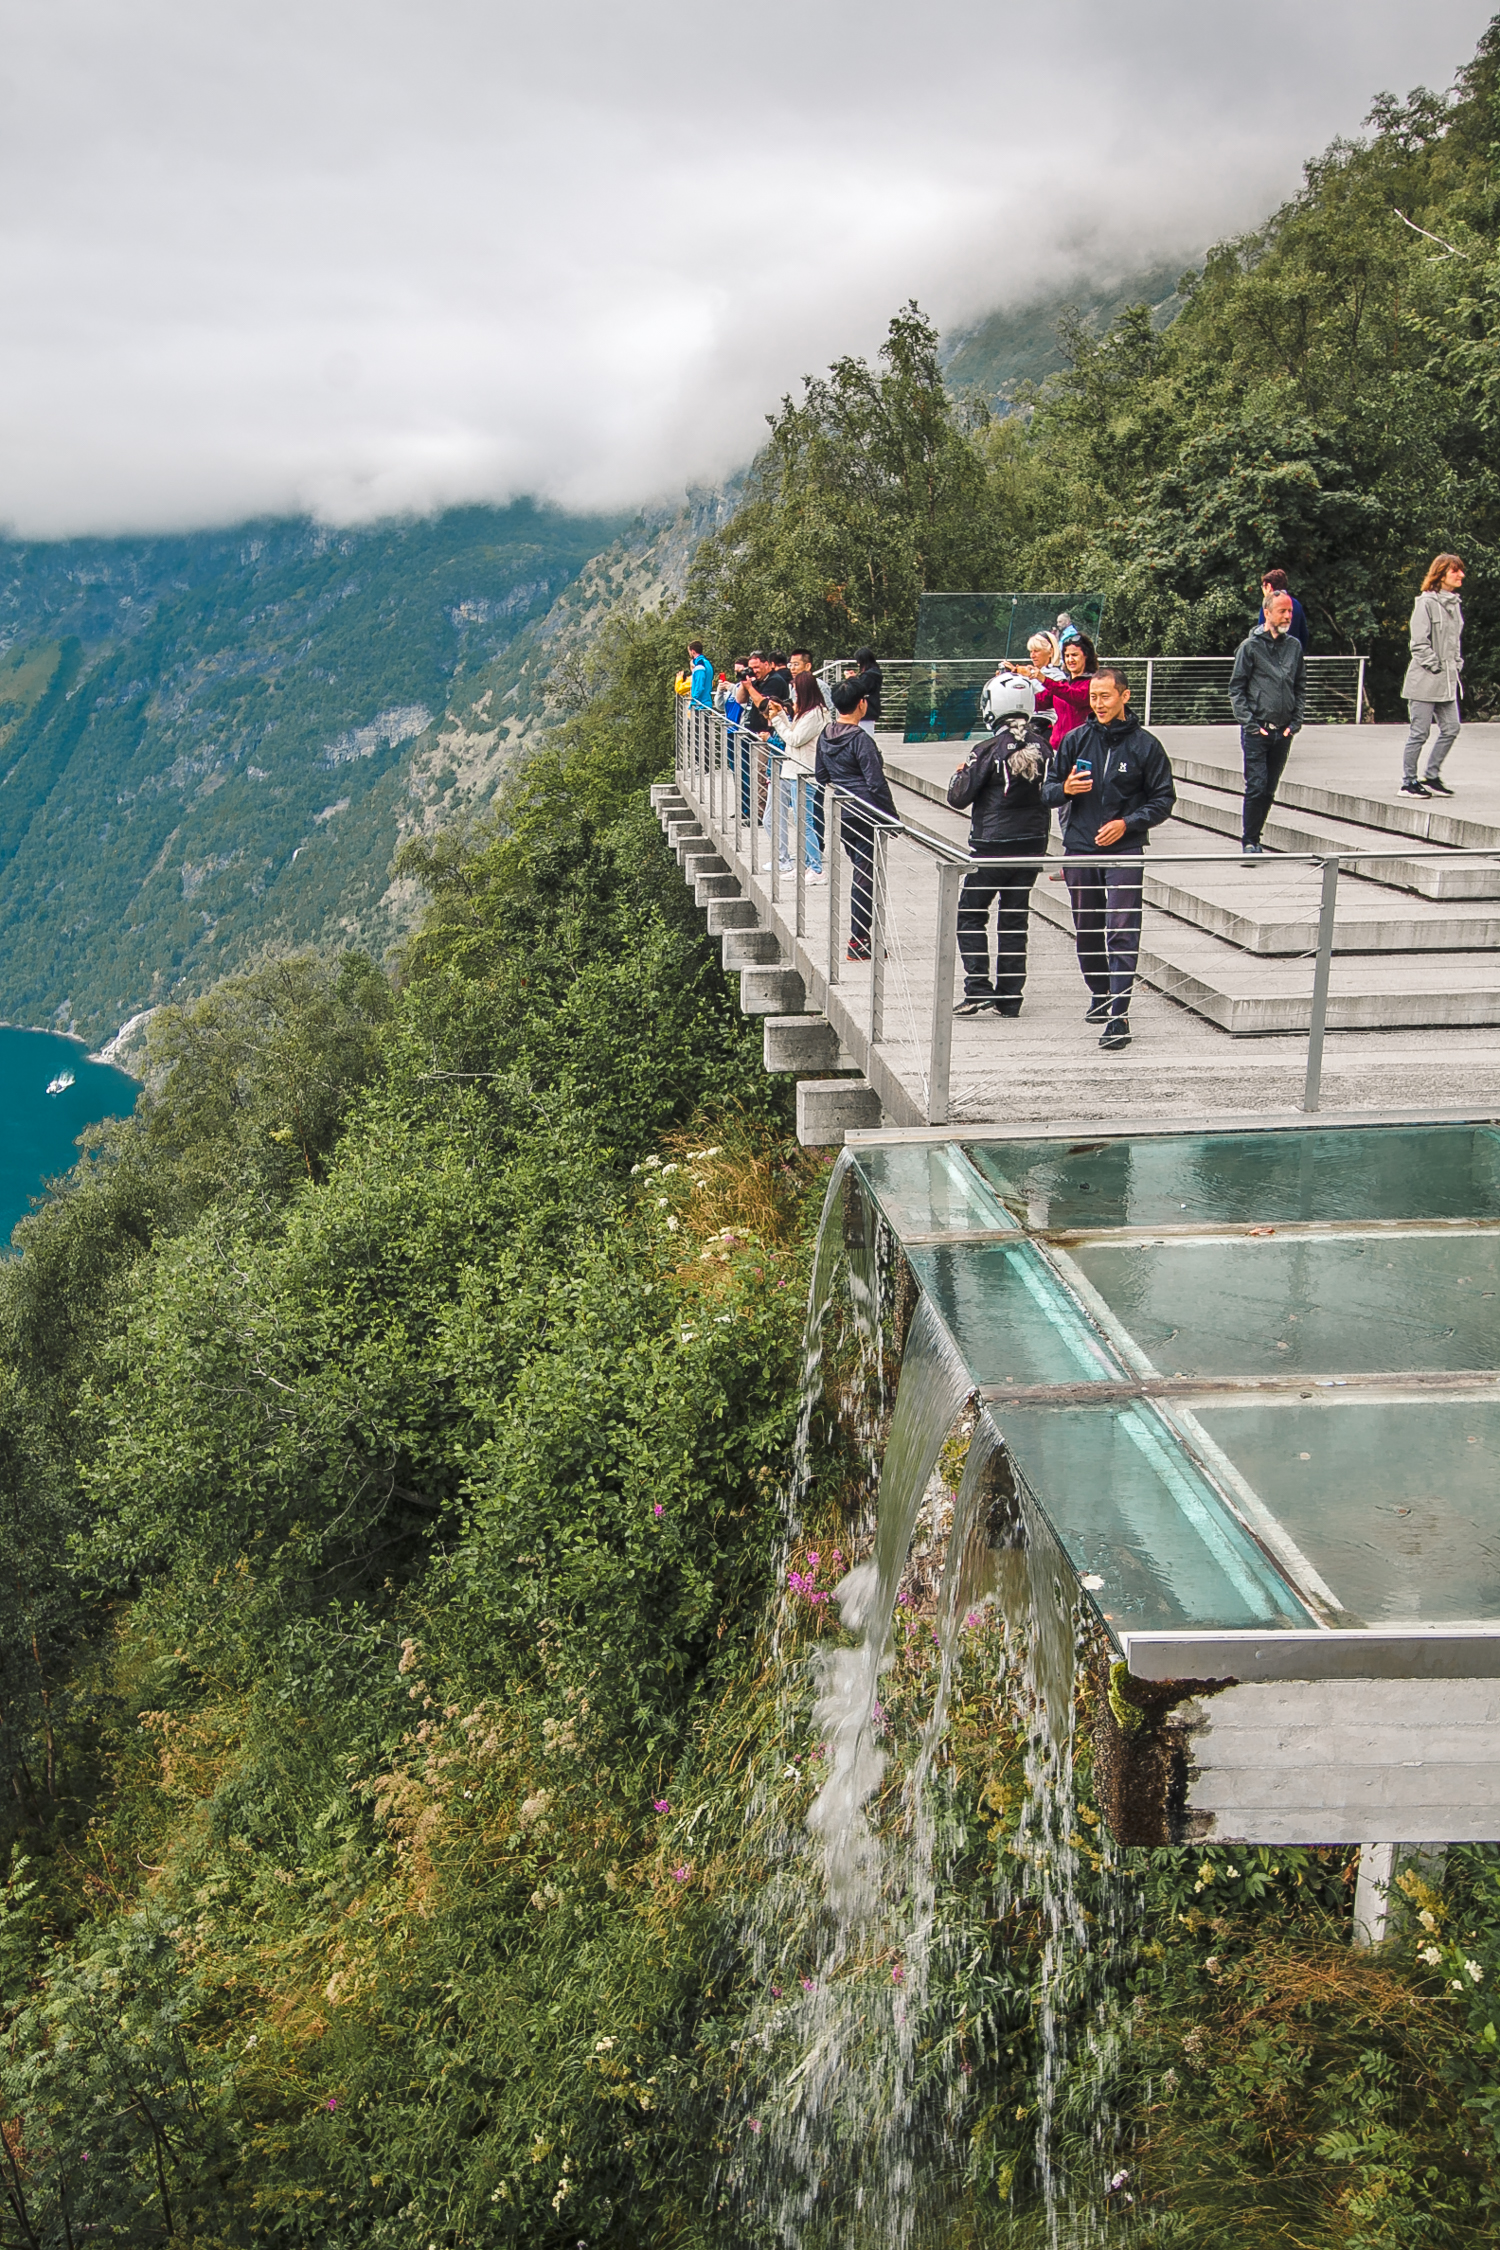 punkt widokowy geiranger atrakcje norwegii